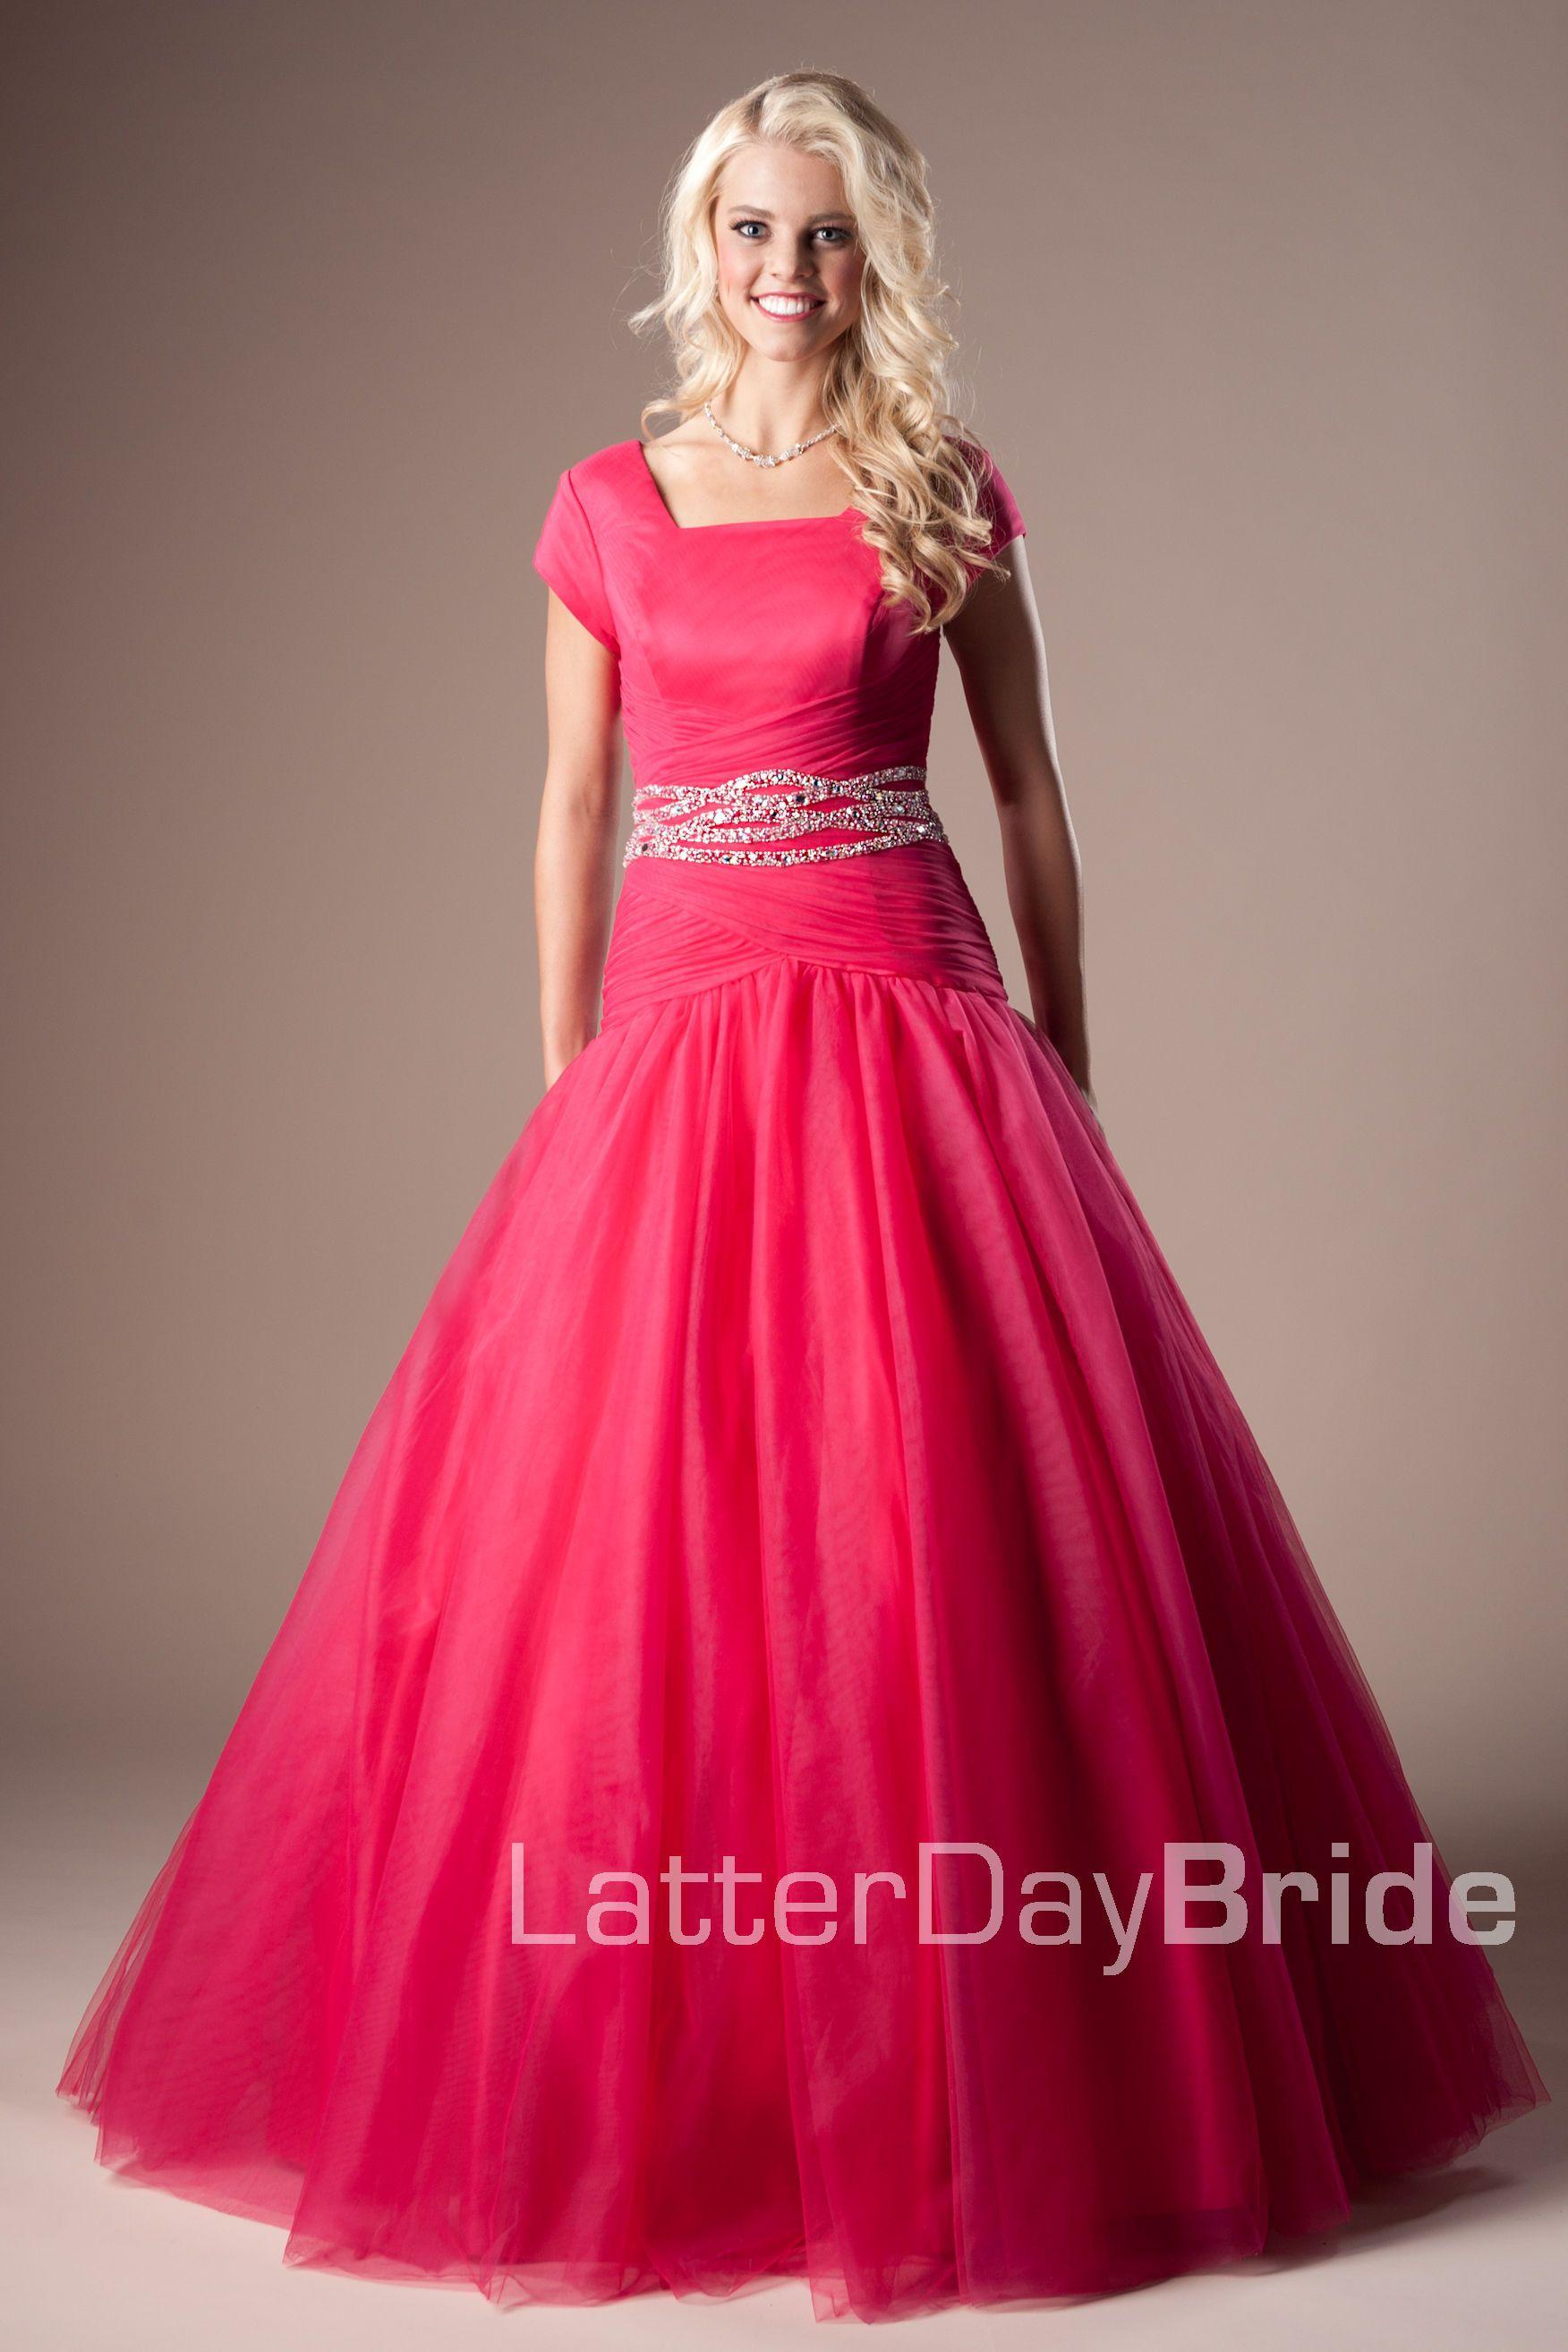 Bridesmaid & Prom, Marissa   LatterDayBride & Prom -Modest Mormon ...